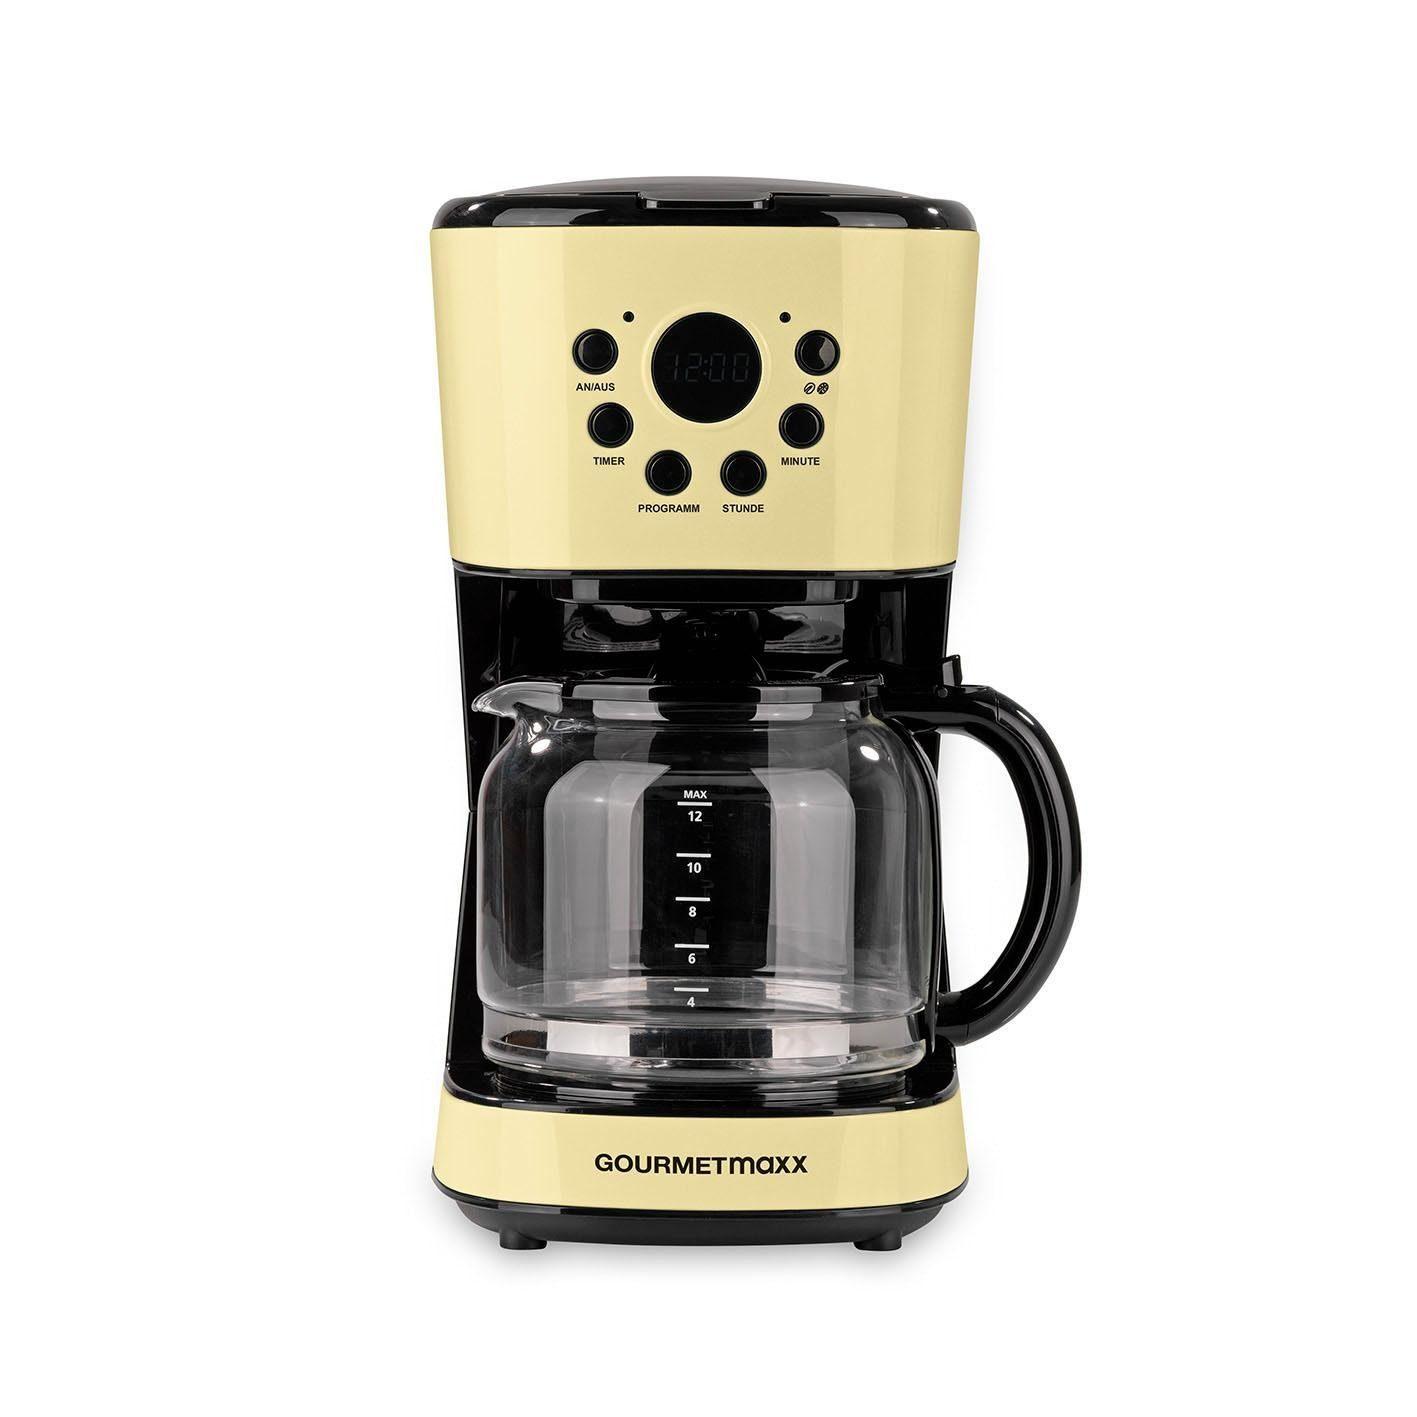 Retro Kühlschrank Vanille : Gourmetmaxx filterkaffeemaschine retro w vanille l